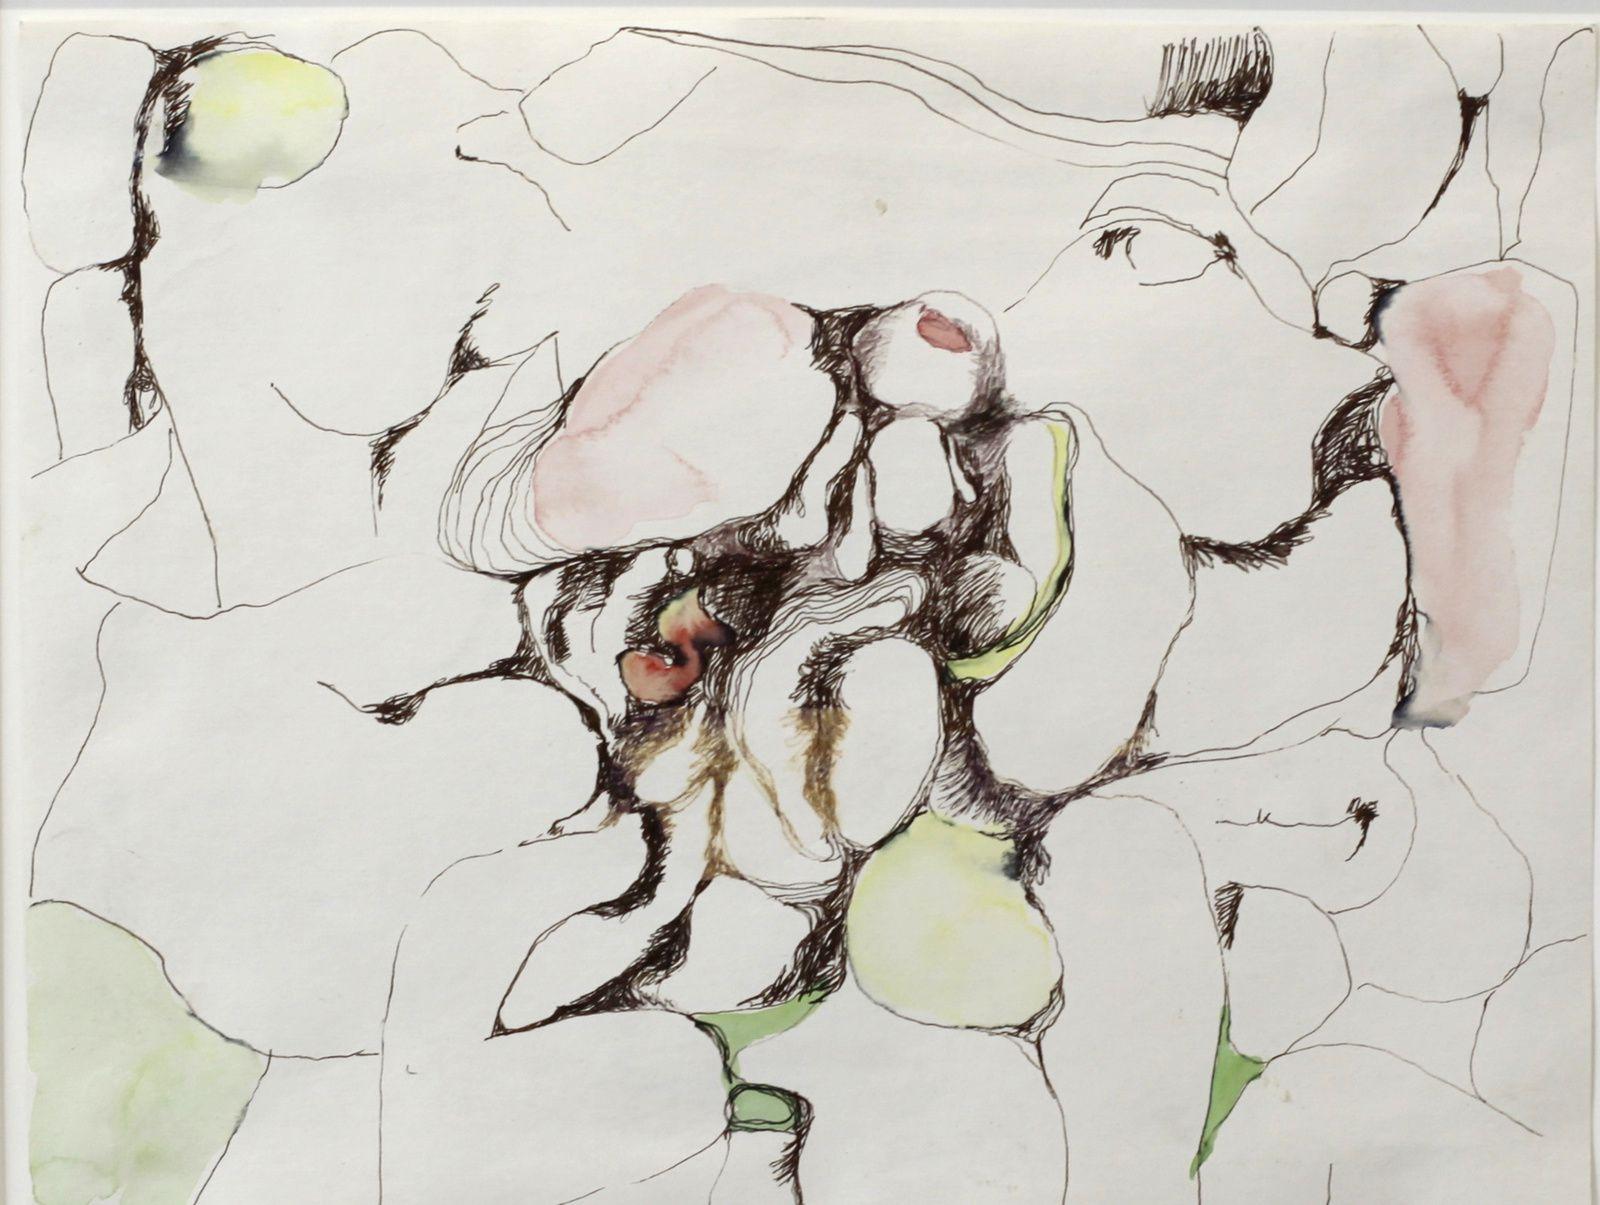 """Paysage humain III"", 1971 d'Alina Szapocznikow - Courtesy Galerie Loevenbruck © photo Éric Simon"